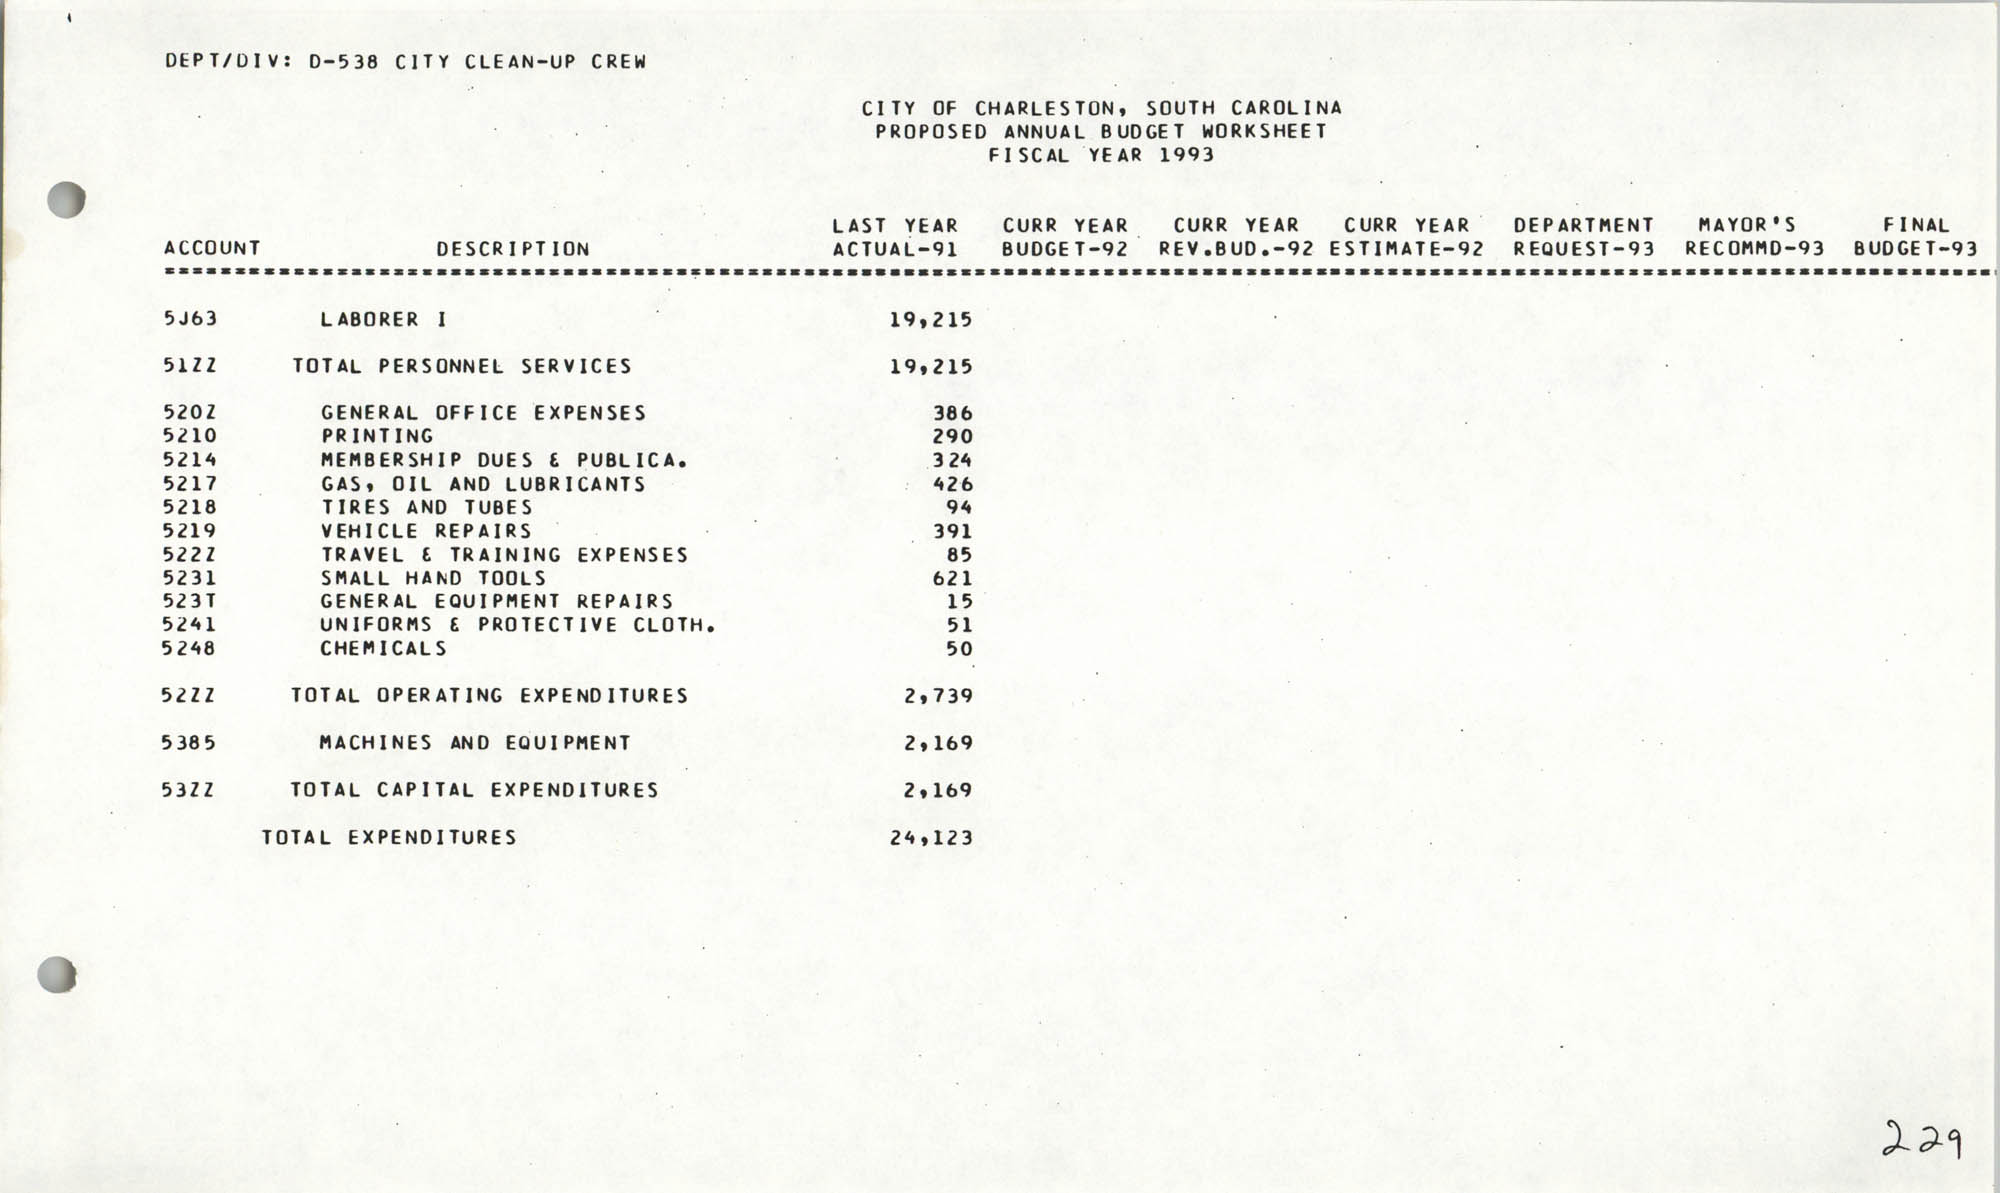 The City Council of Charleston, South Carolina, 1993 Budget, Page 229